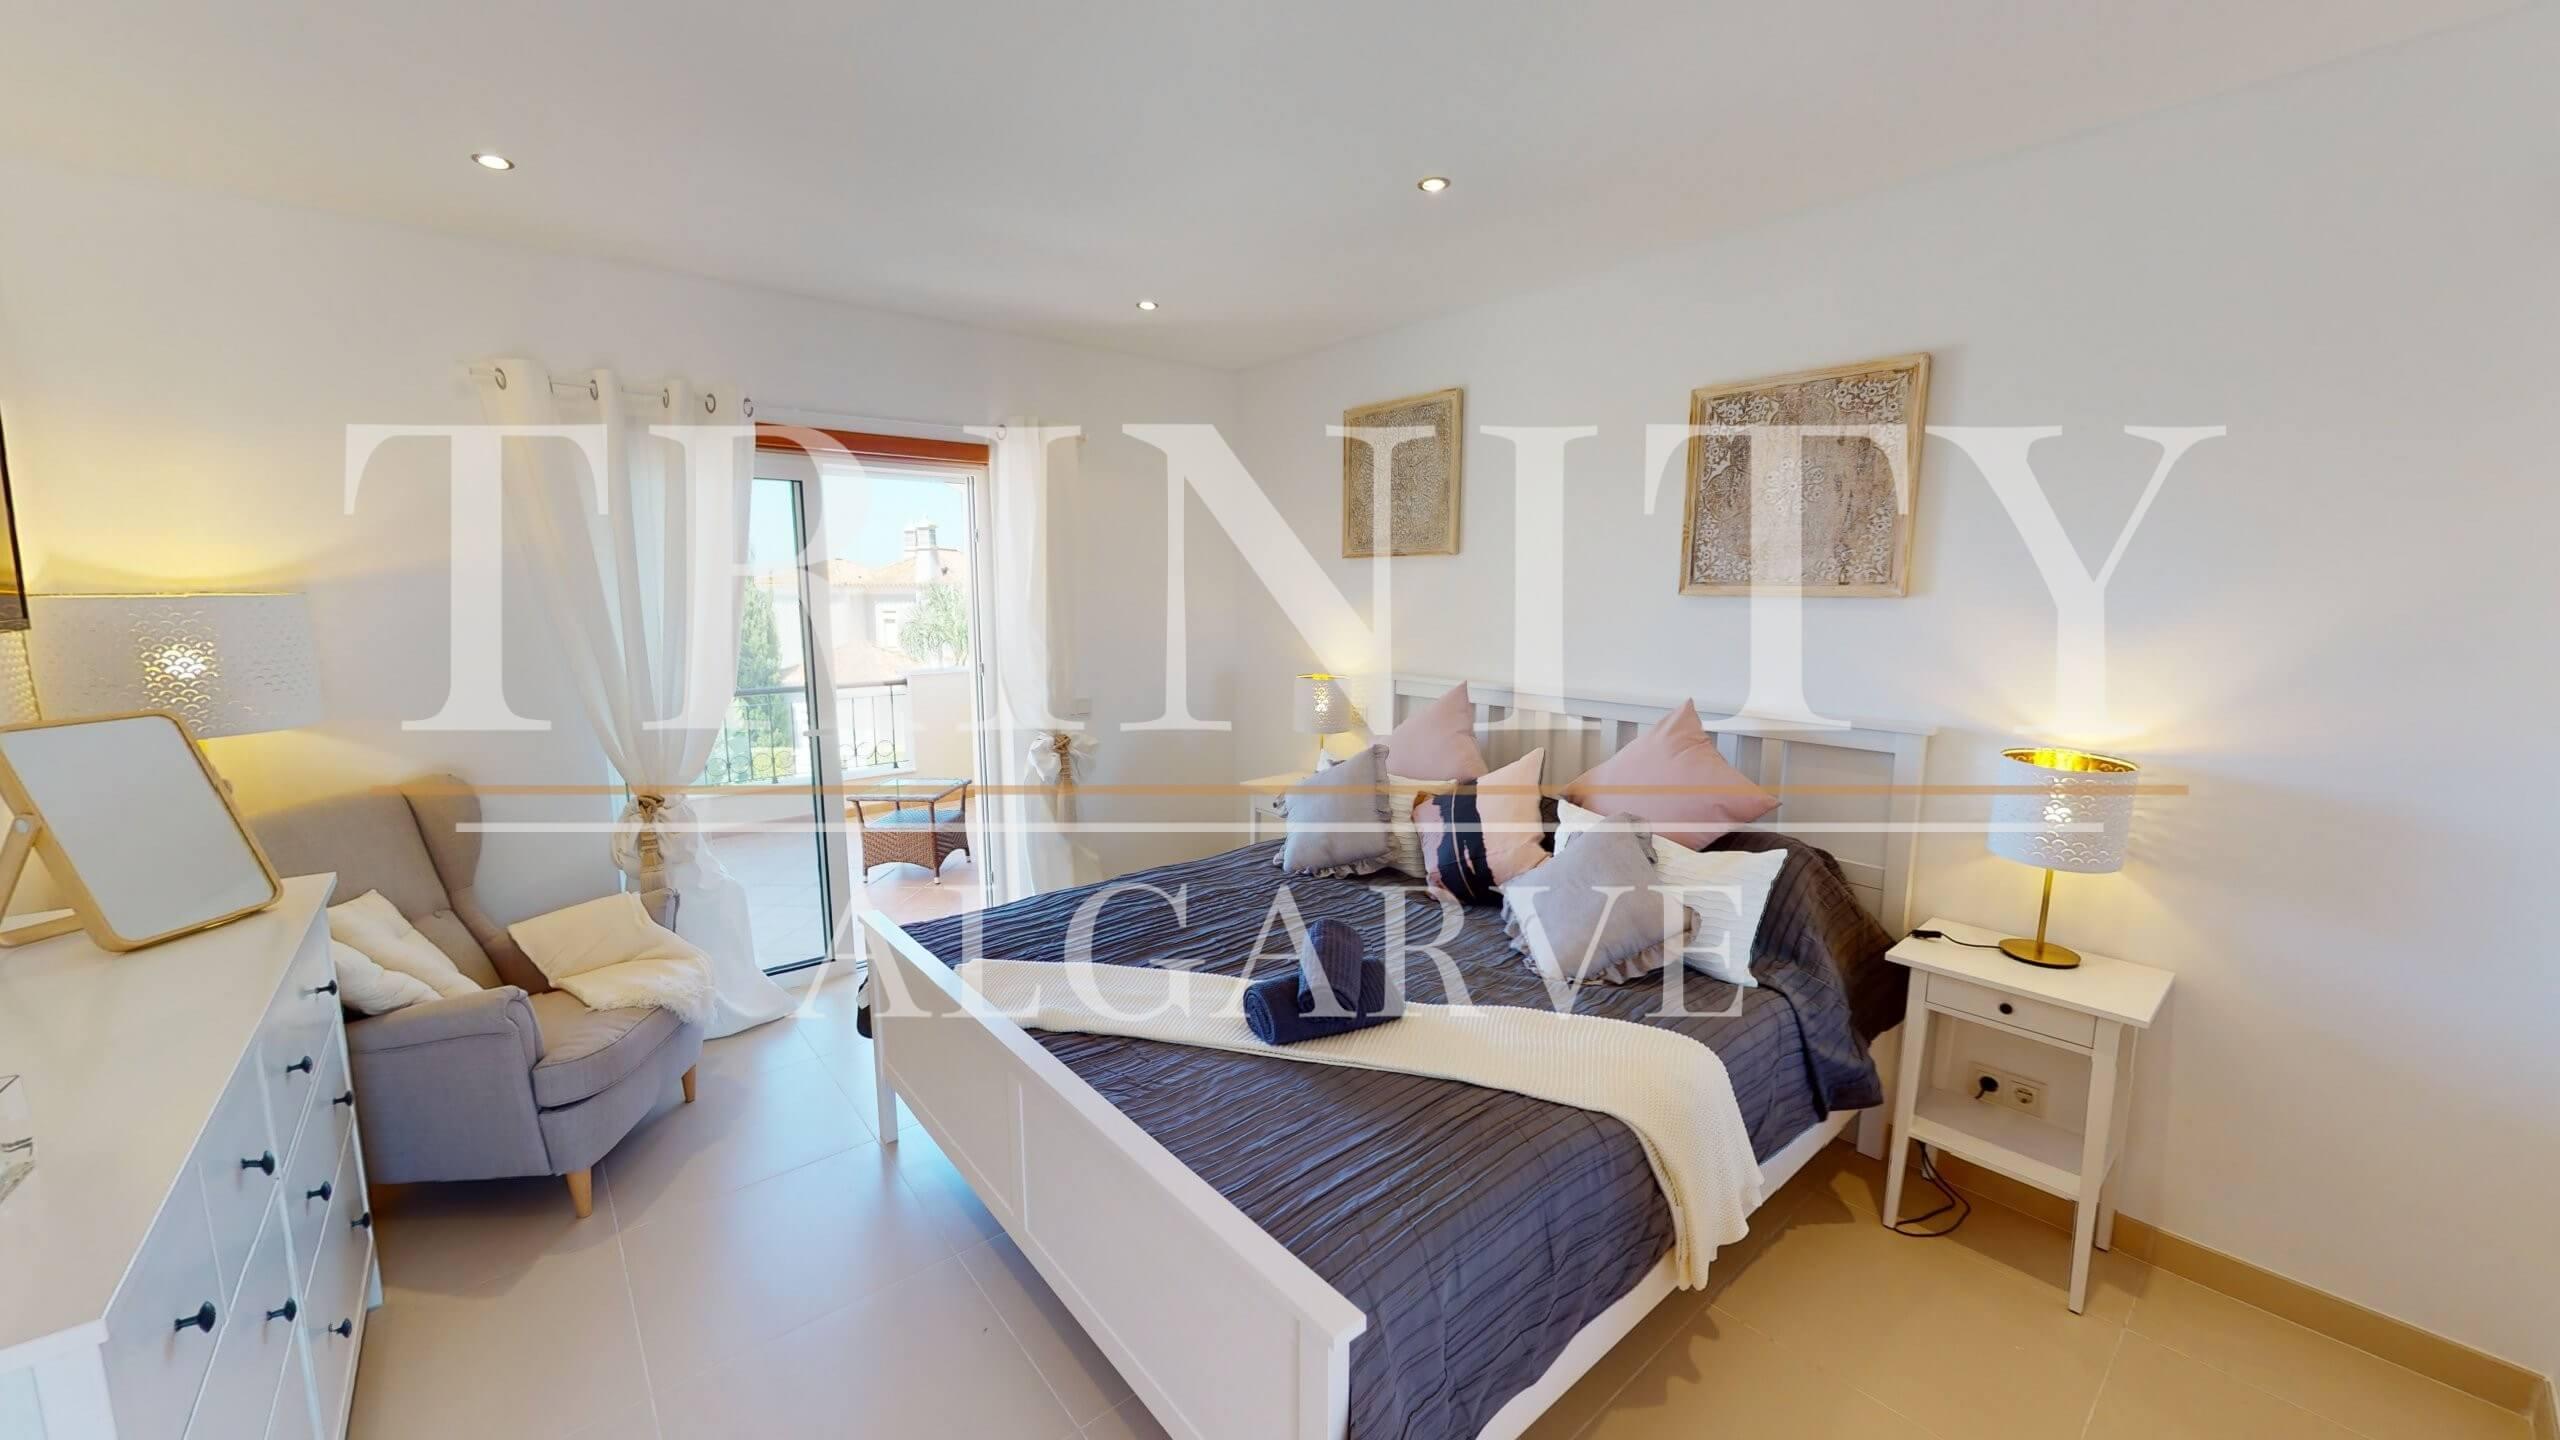 35-The-Crest-by-Trinity-Algarve-07032020_114141